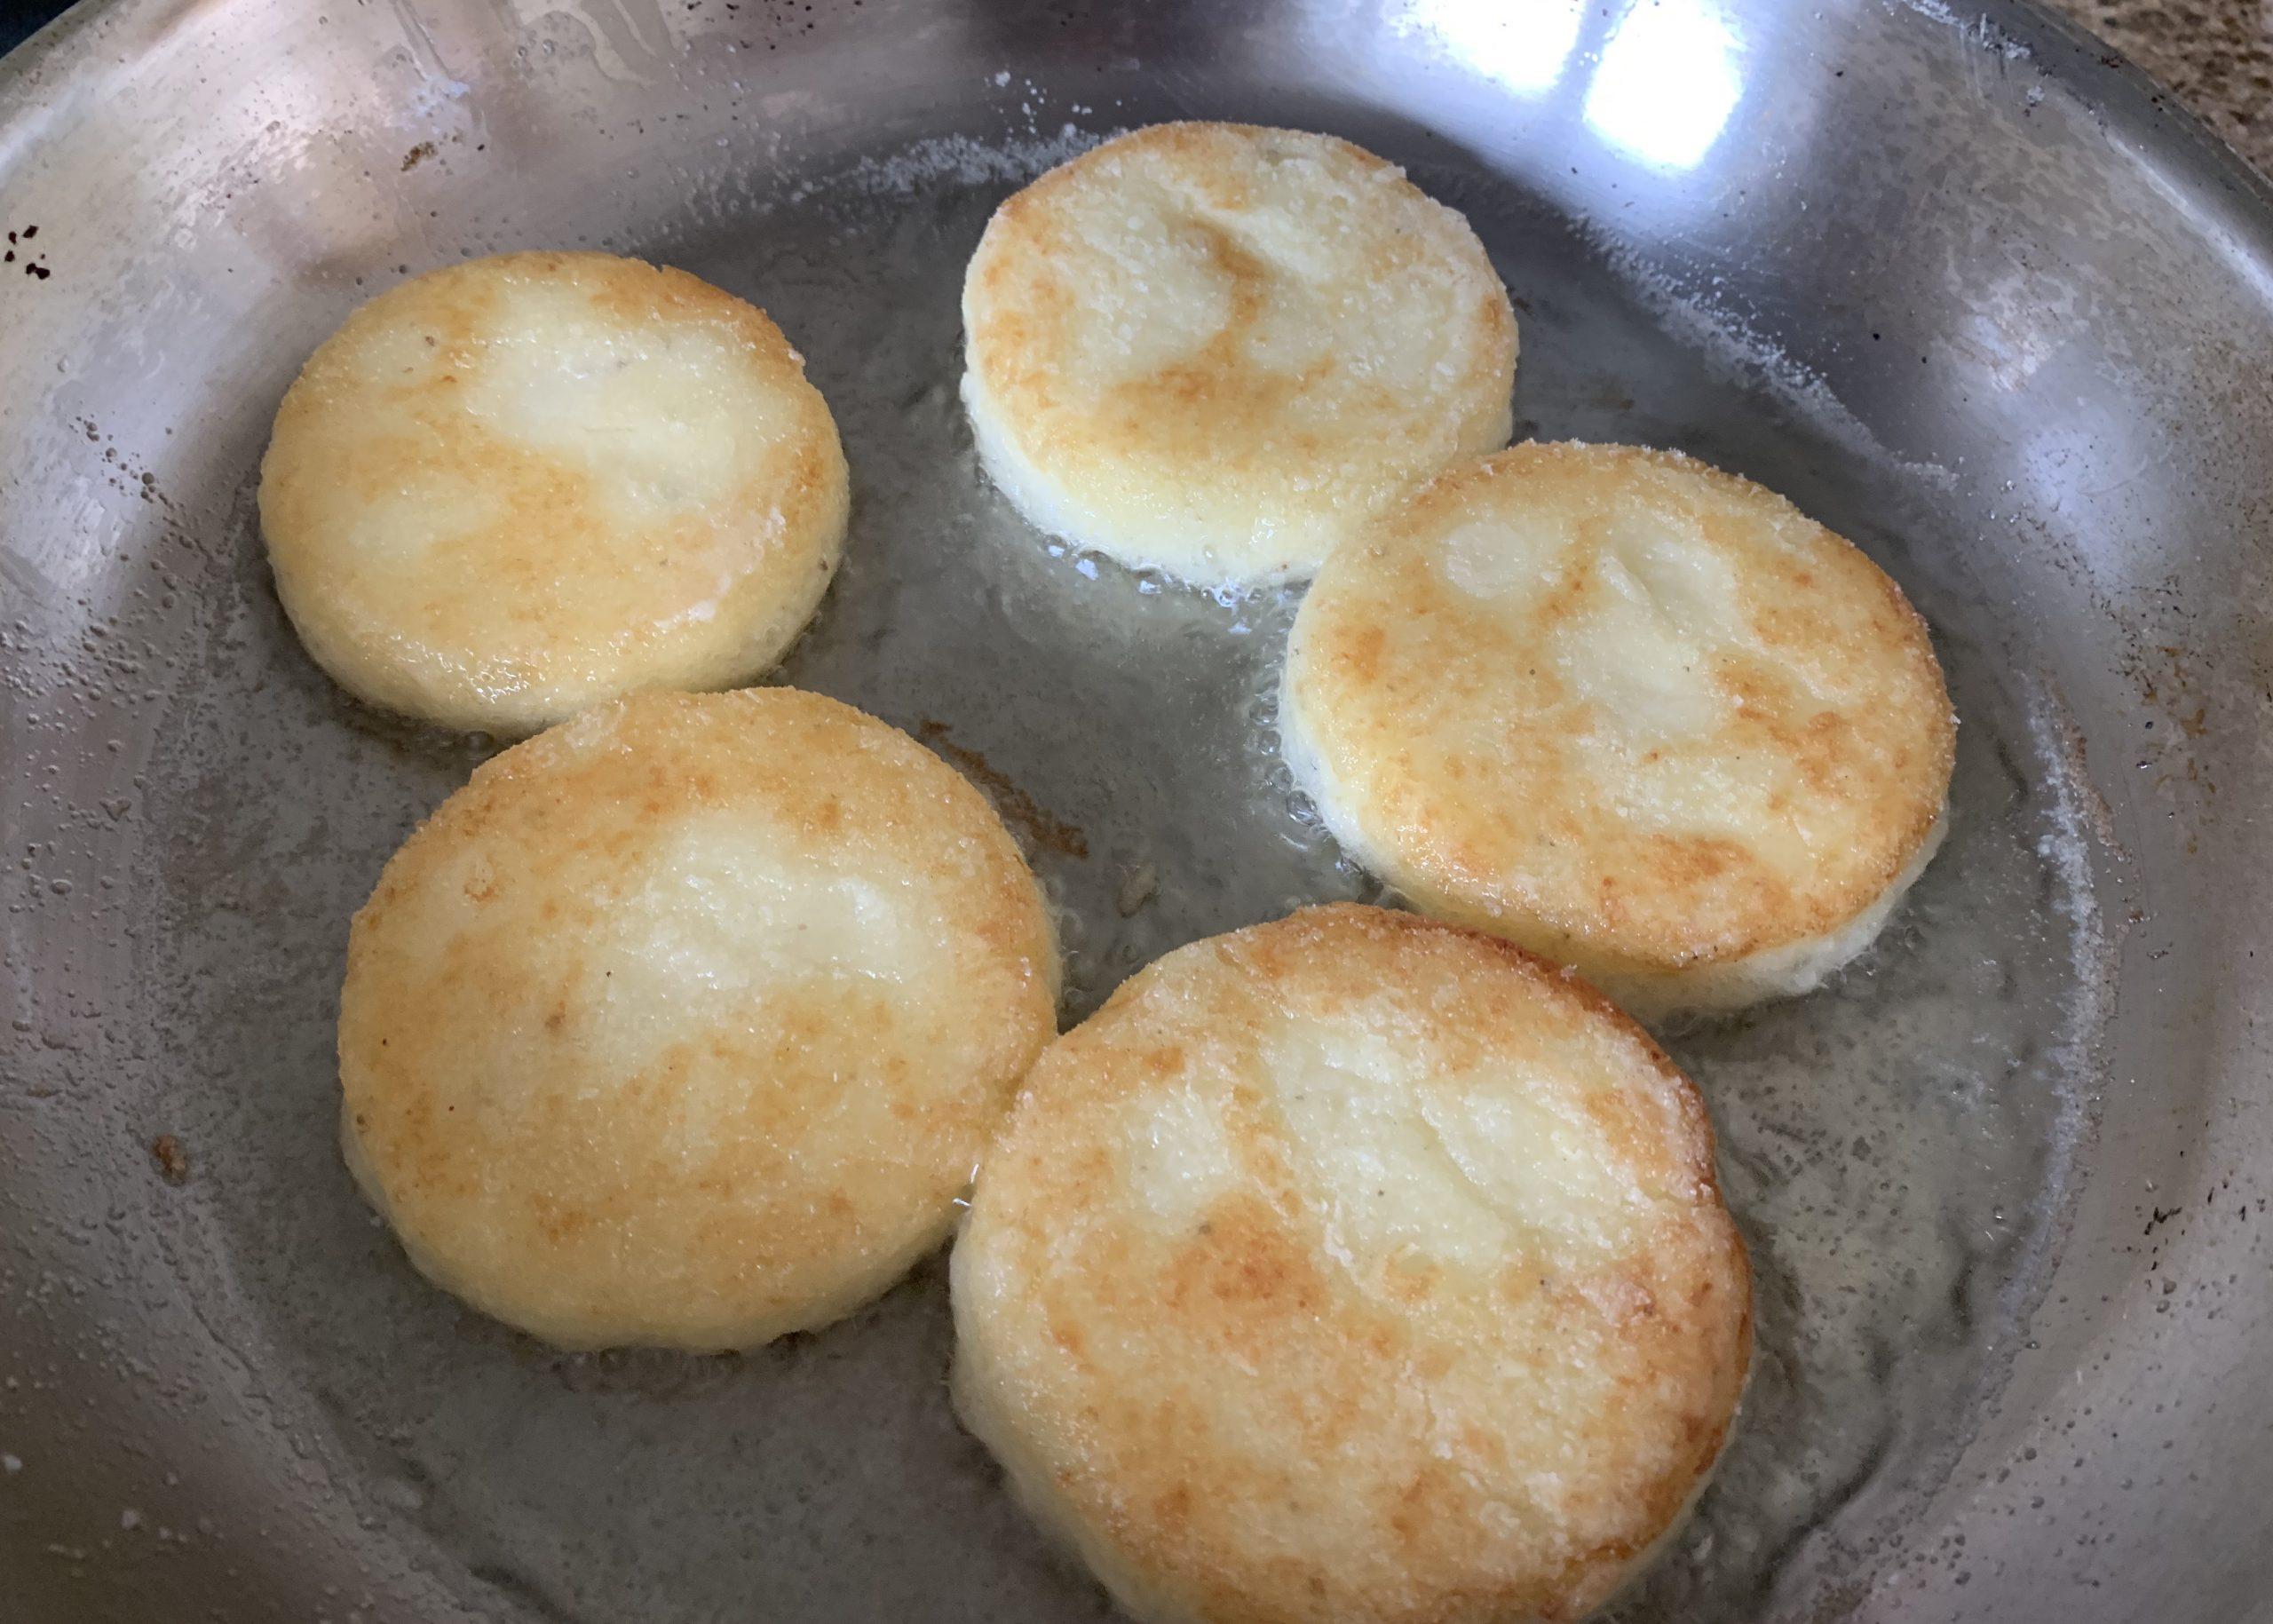 Gluten free potato cakes in a frying pan